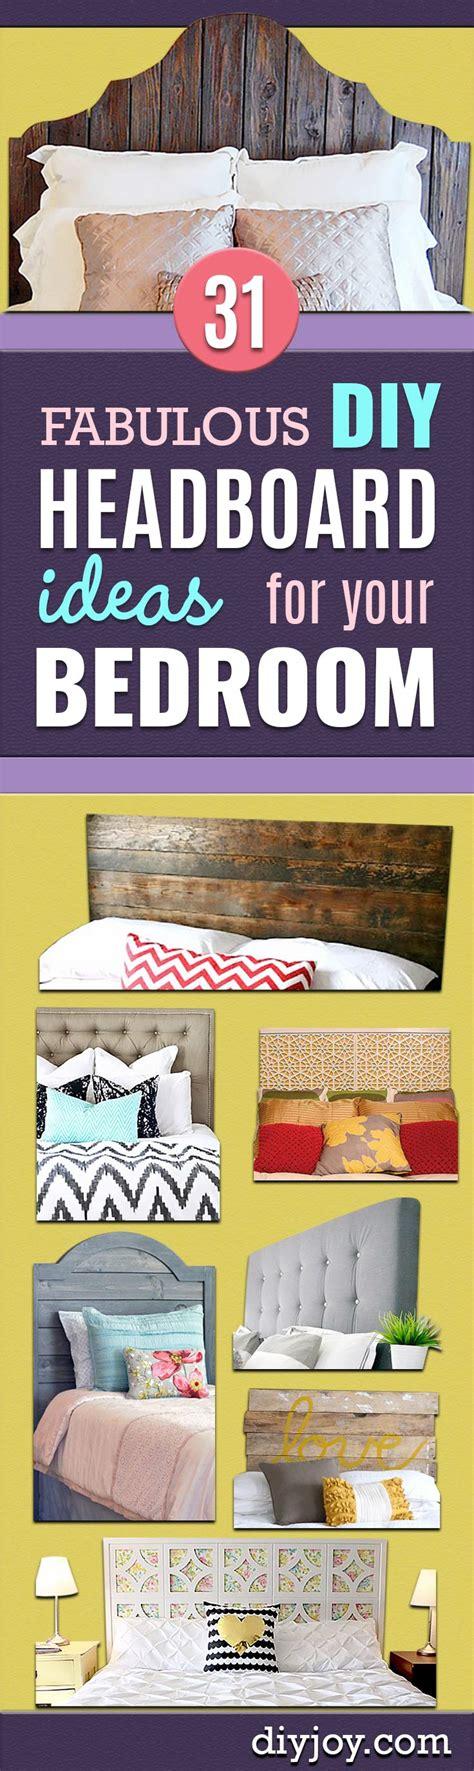 do it yourself headboard ideas 31 fabulous diy headboard ideas for your bedroom page 3